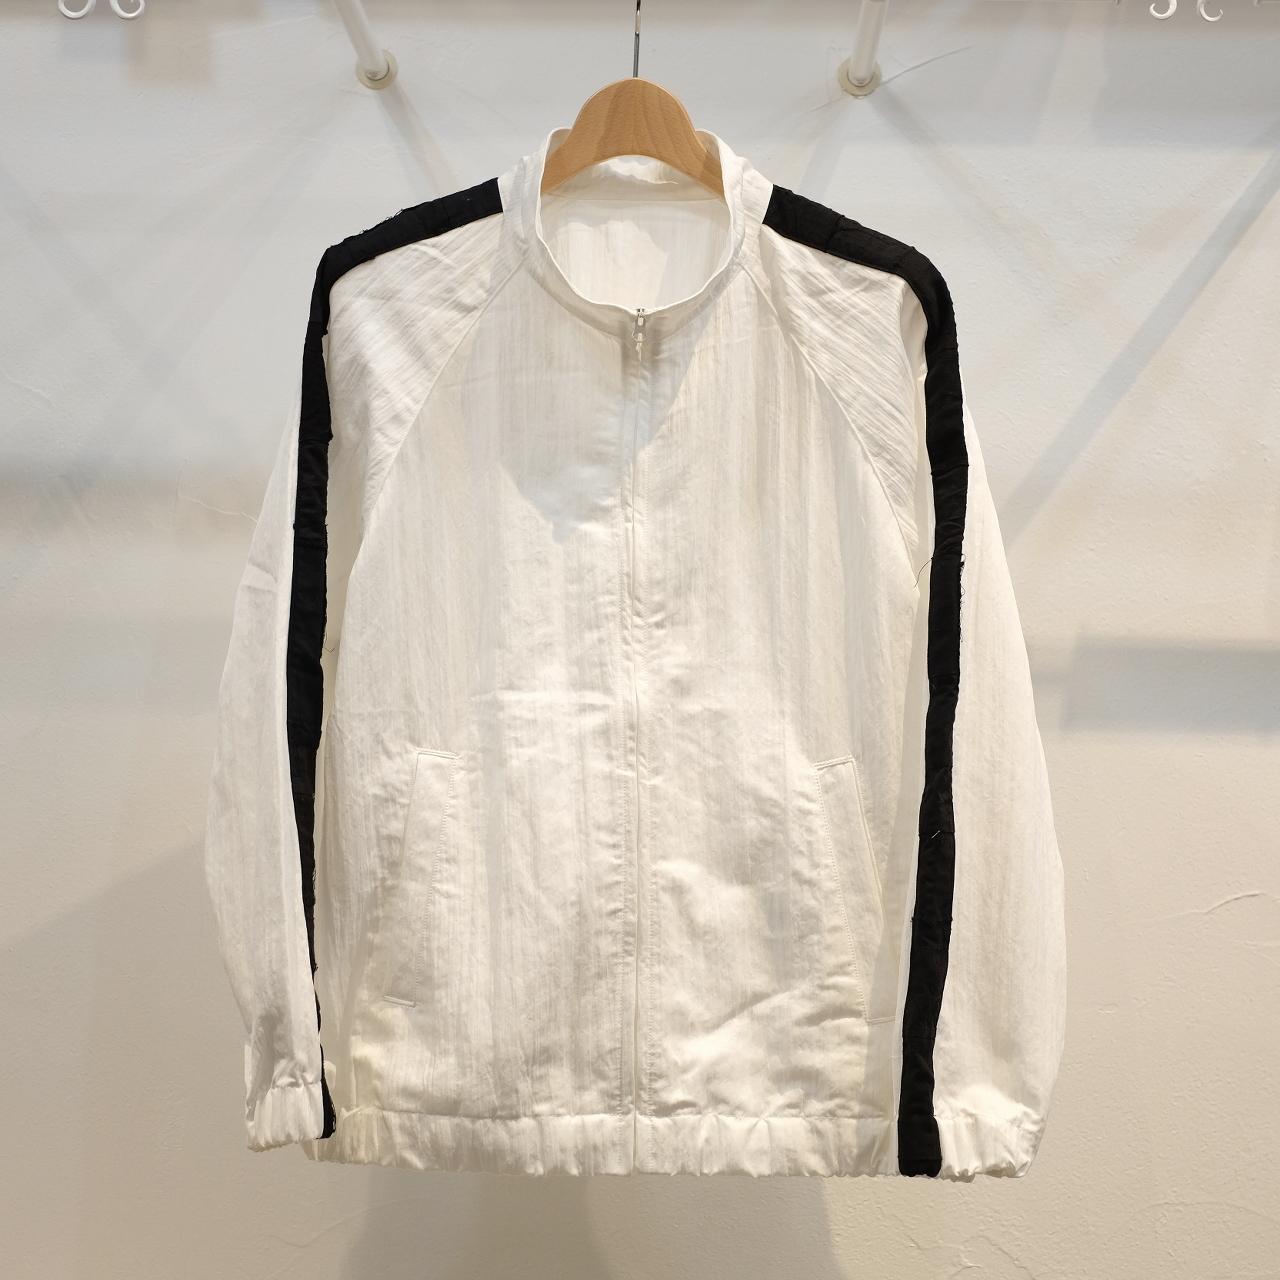 KUON(クオン) アップサイクルトリミング 塩縮ナイロントラックジャケット ホワイト